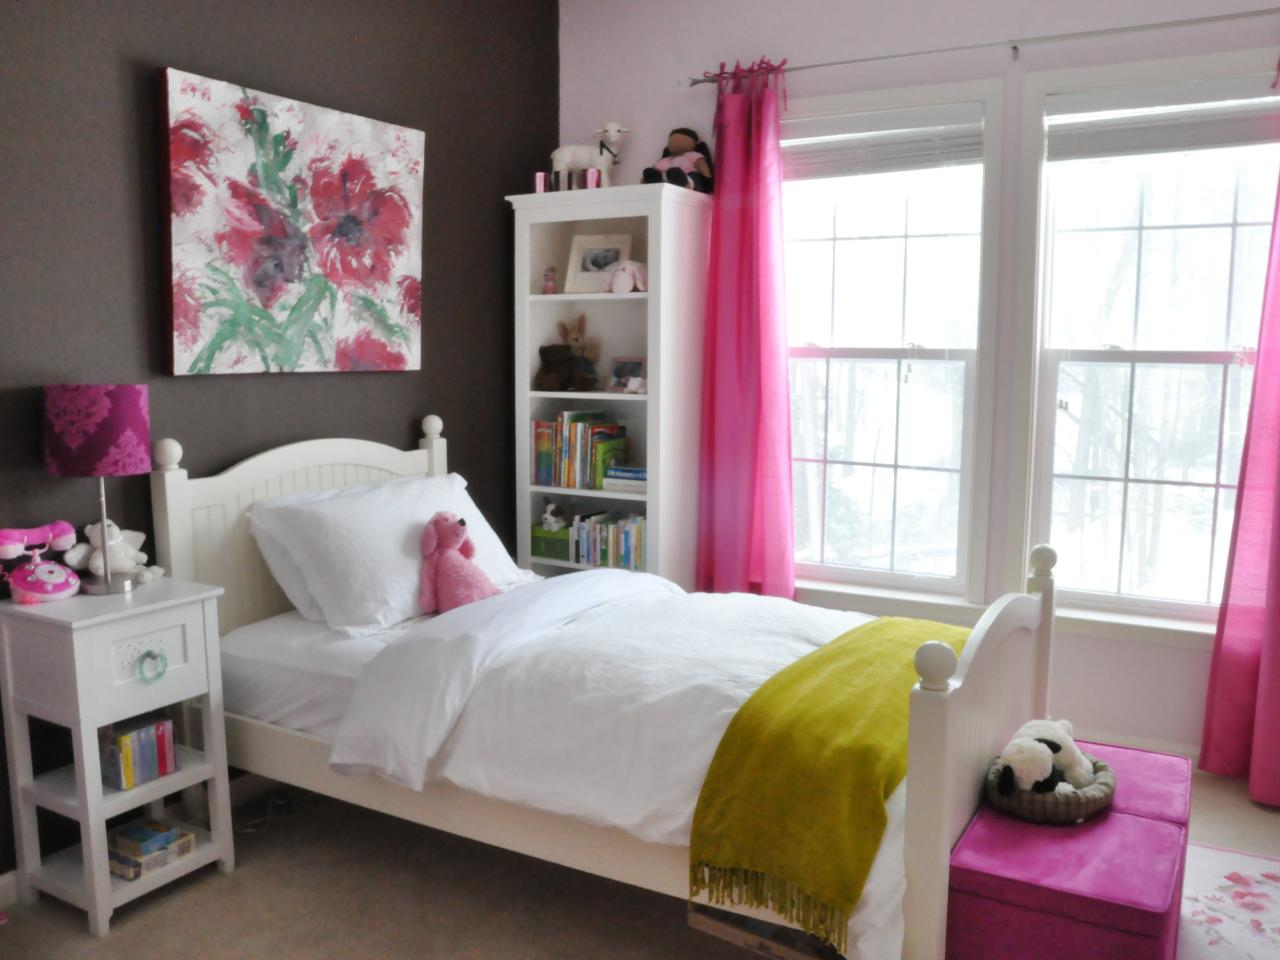 girls bedroom decorations photo - 1